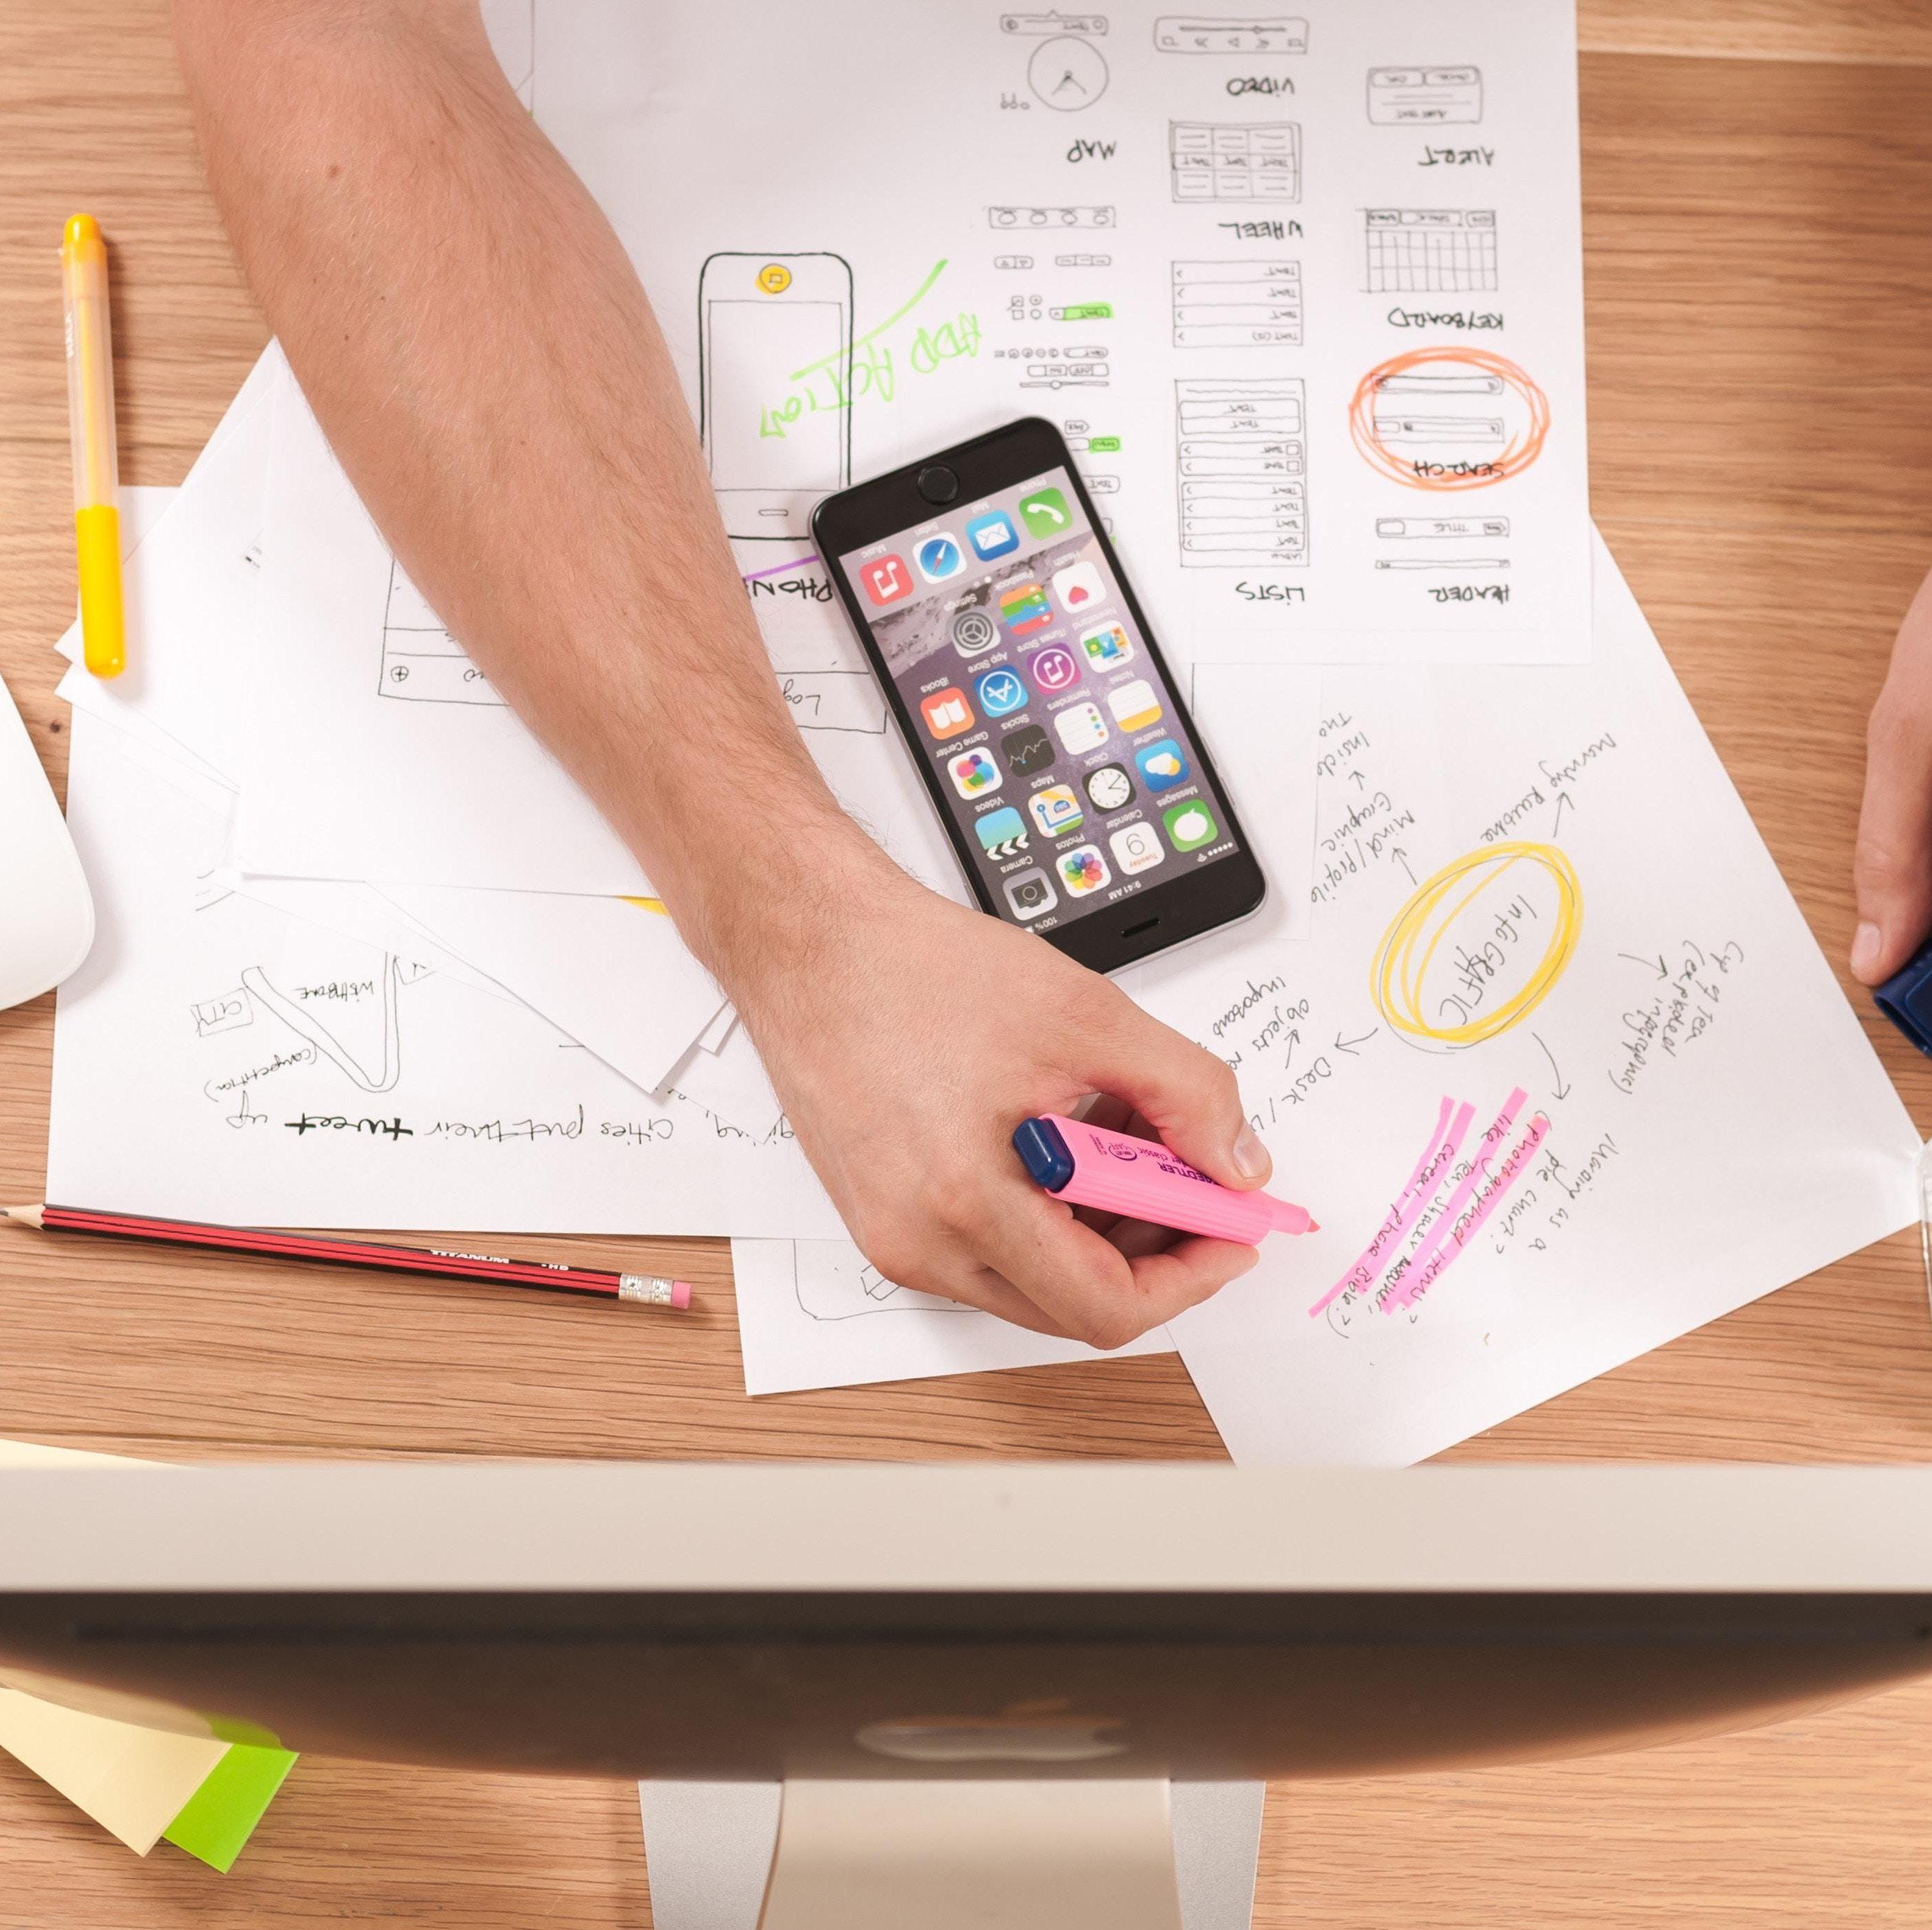 Urbantech NYC | Innovate, Boldly CUNY TechWorks: UX Design